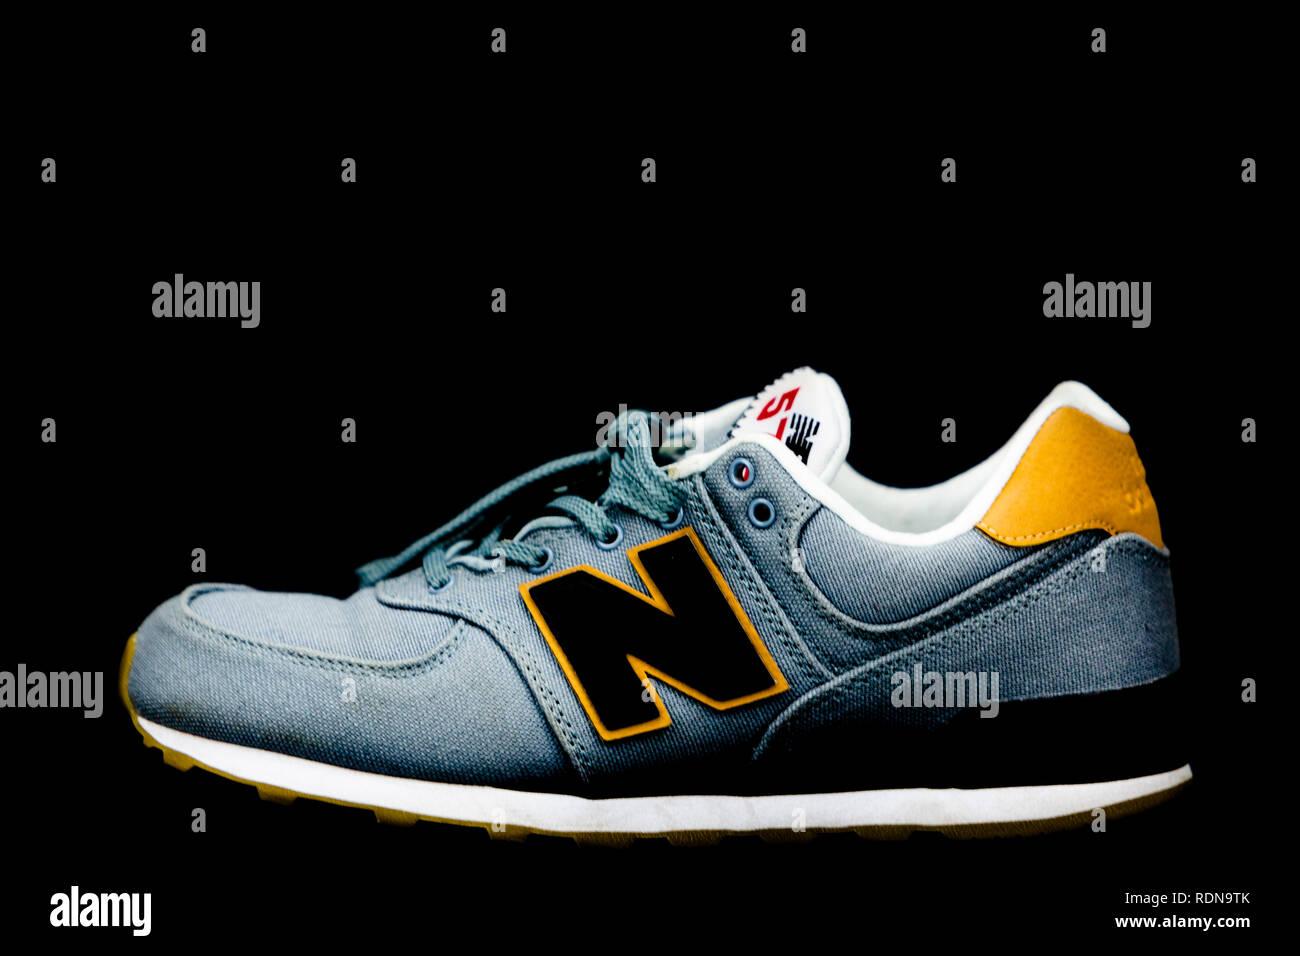 new balance 574 sport usa